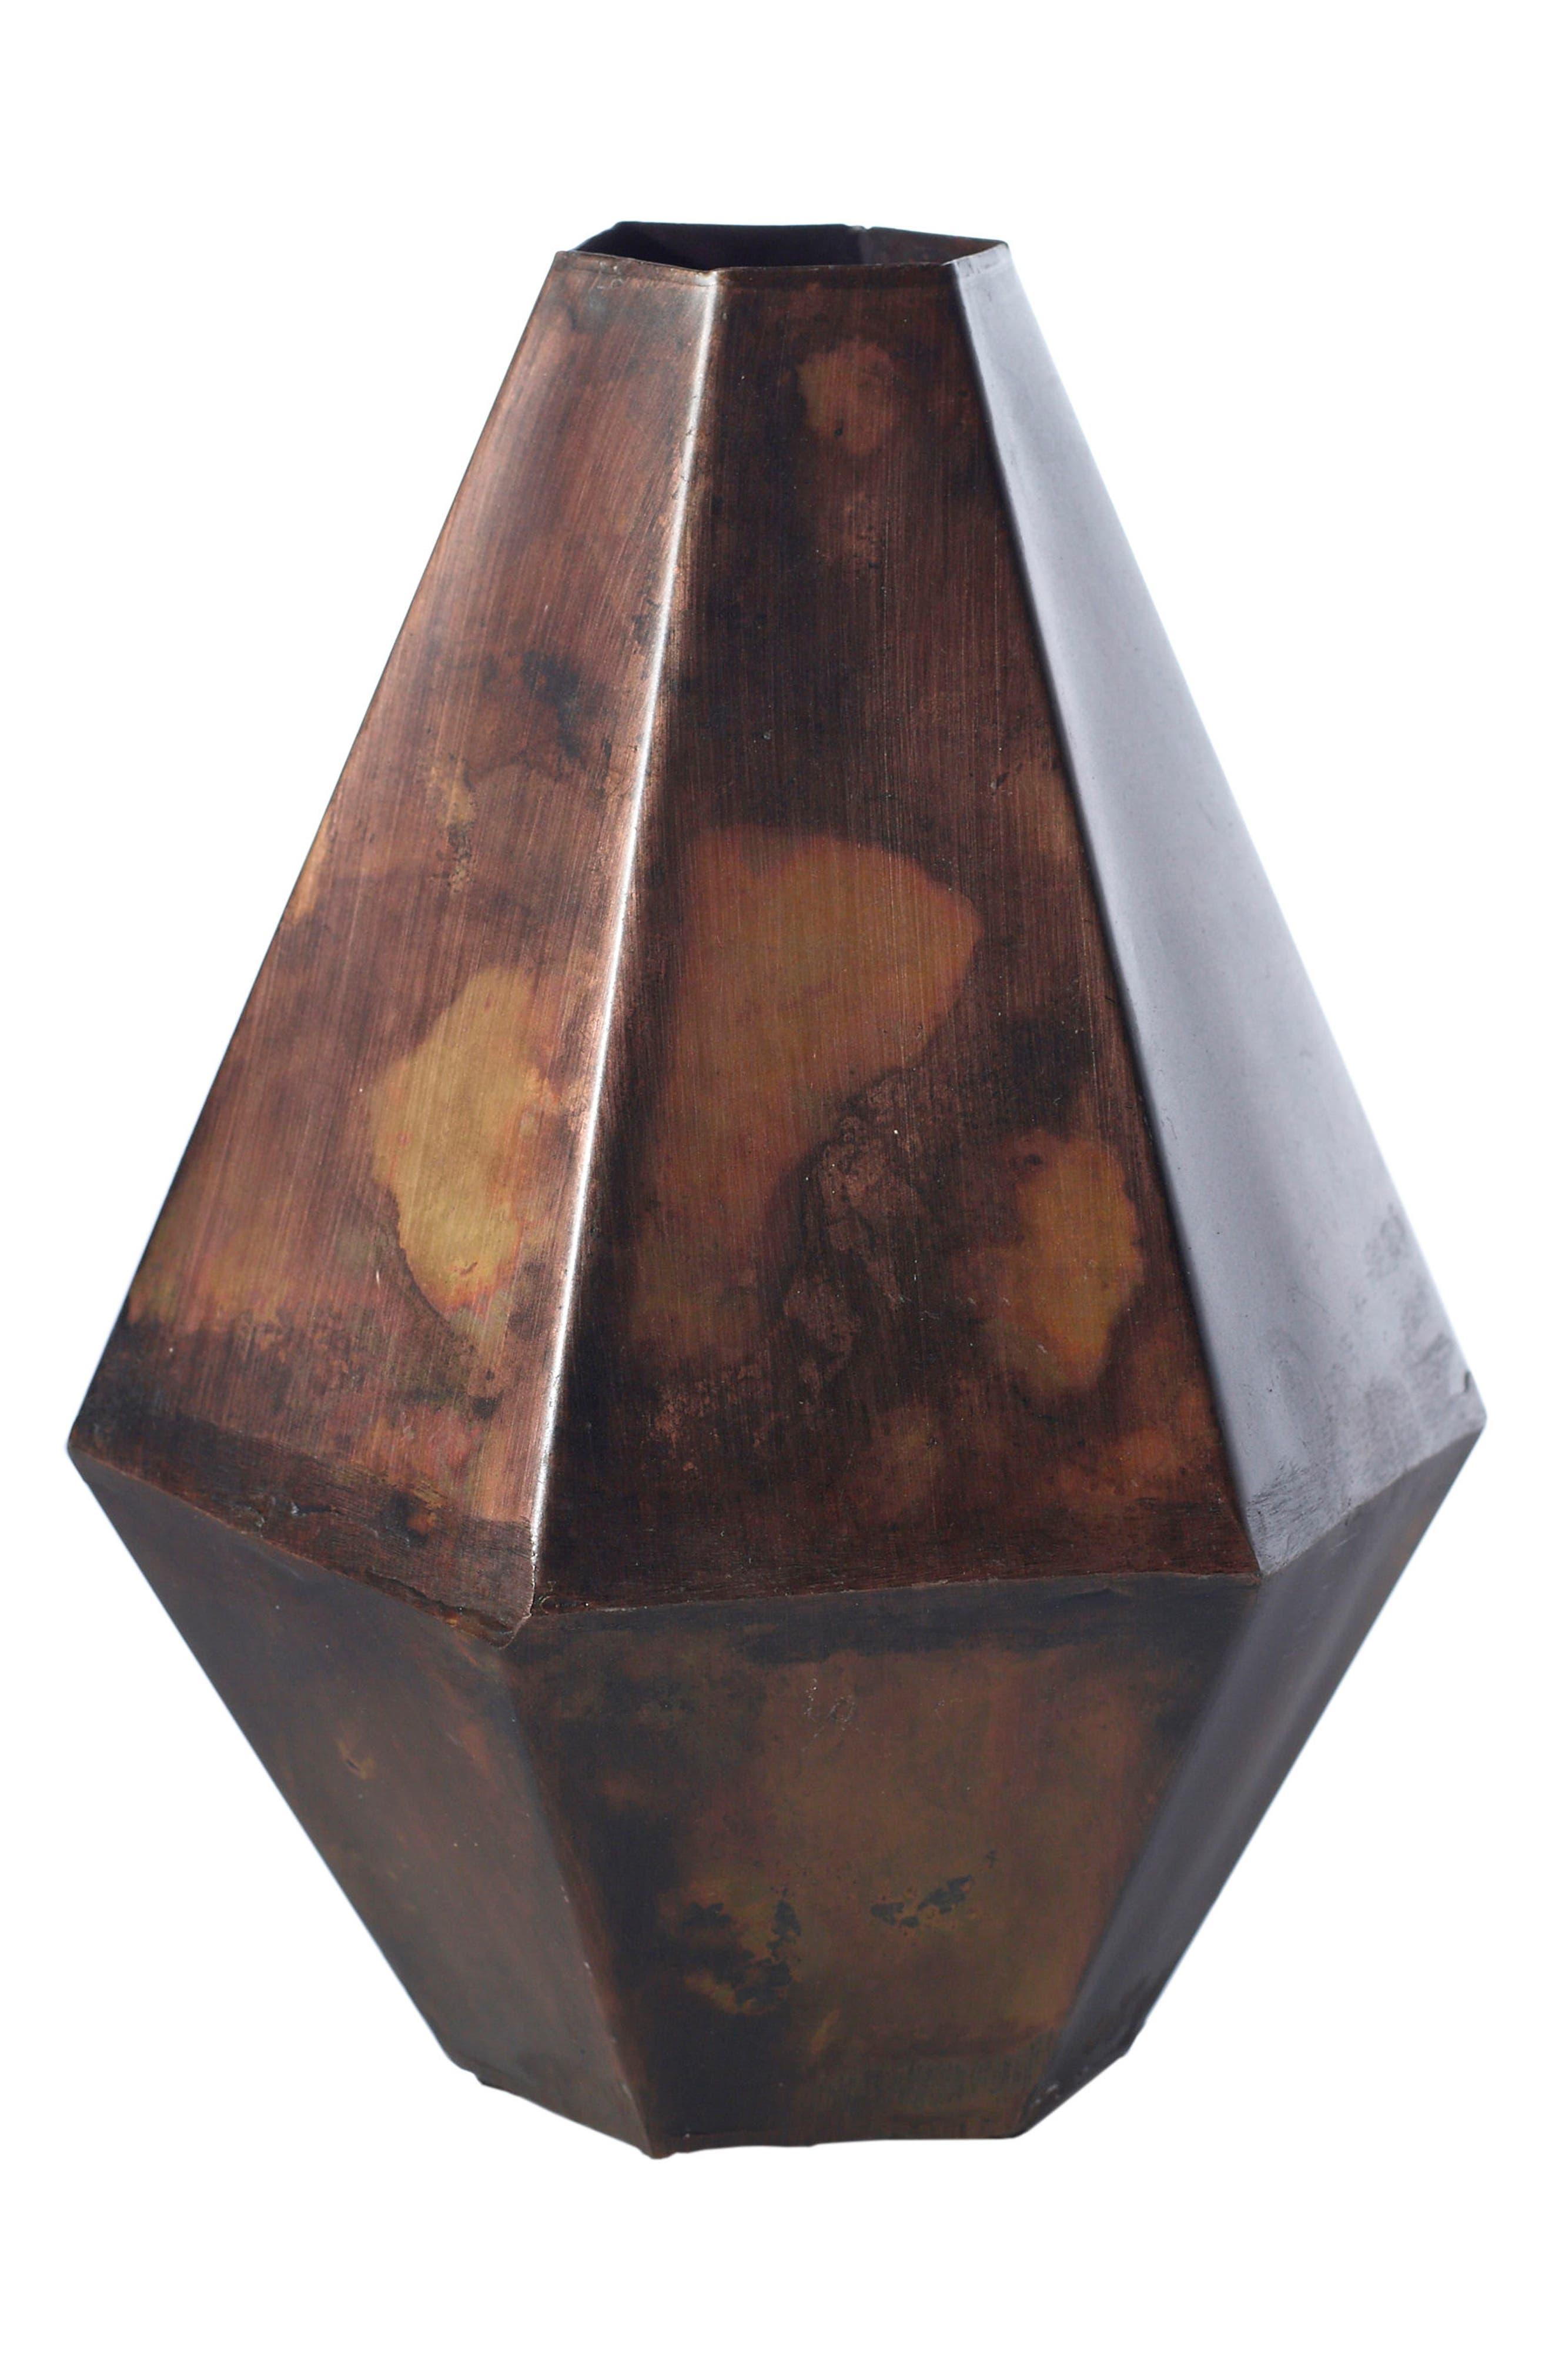 Alternate Image 2  - Accent Decor Copper Finish Bud Vase